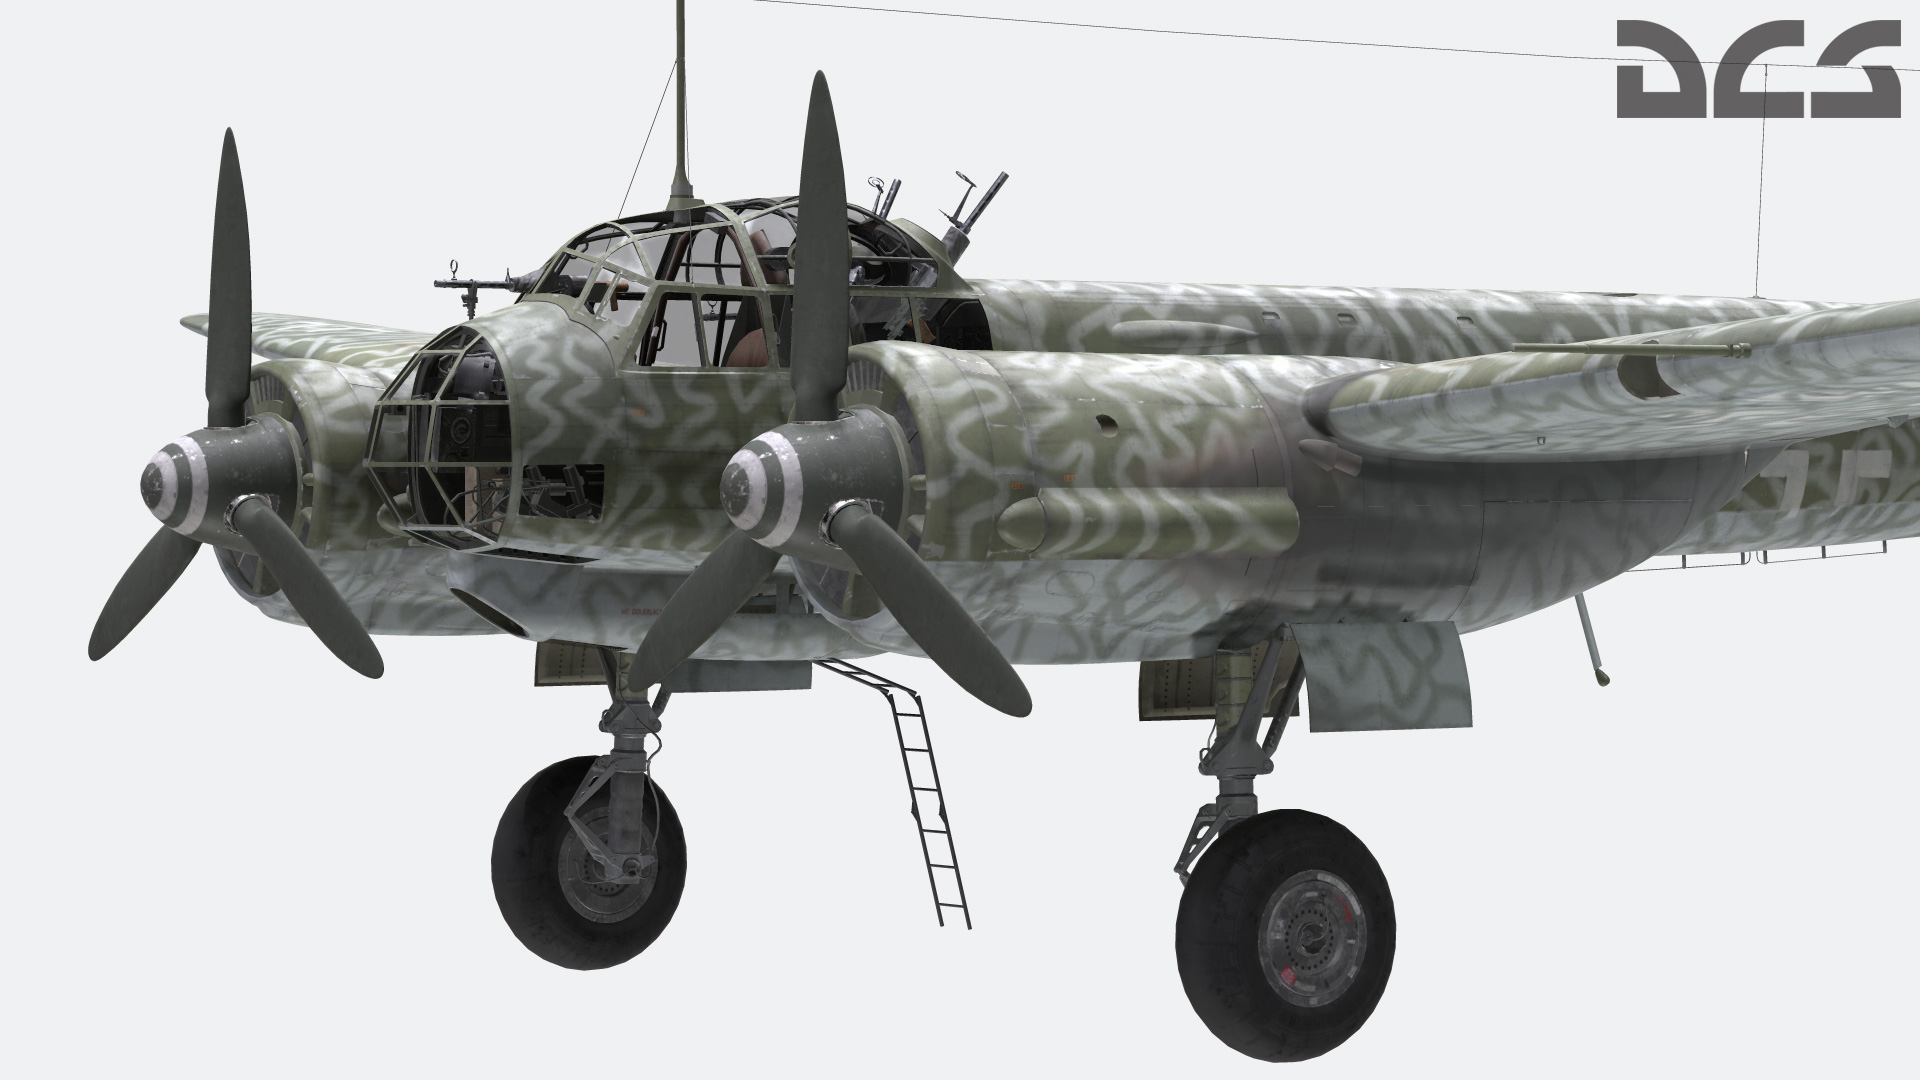 Ju-88-01